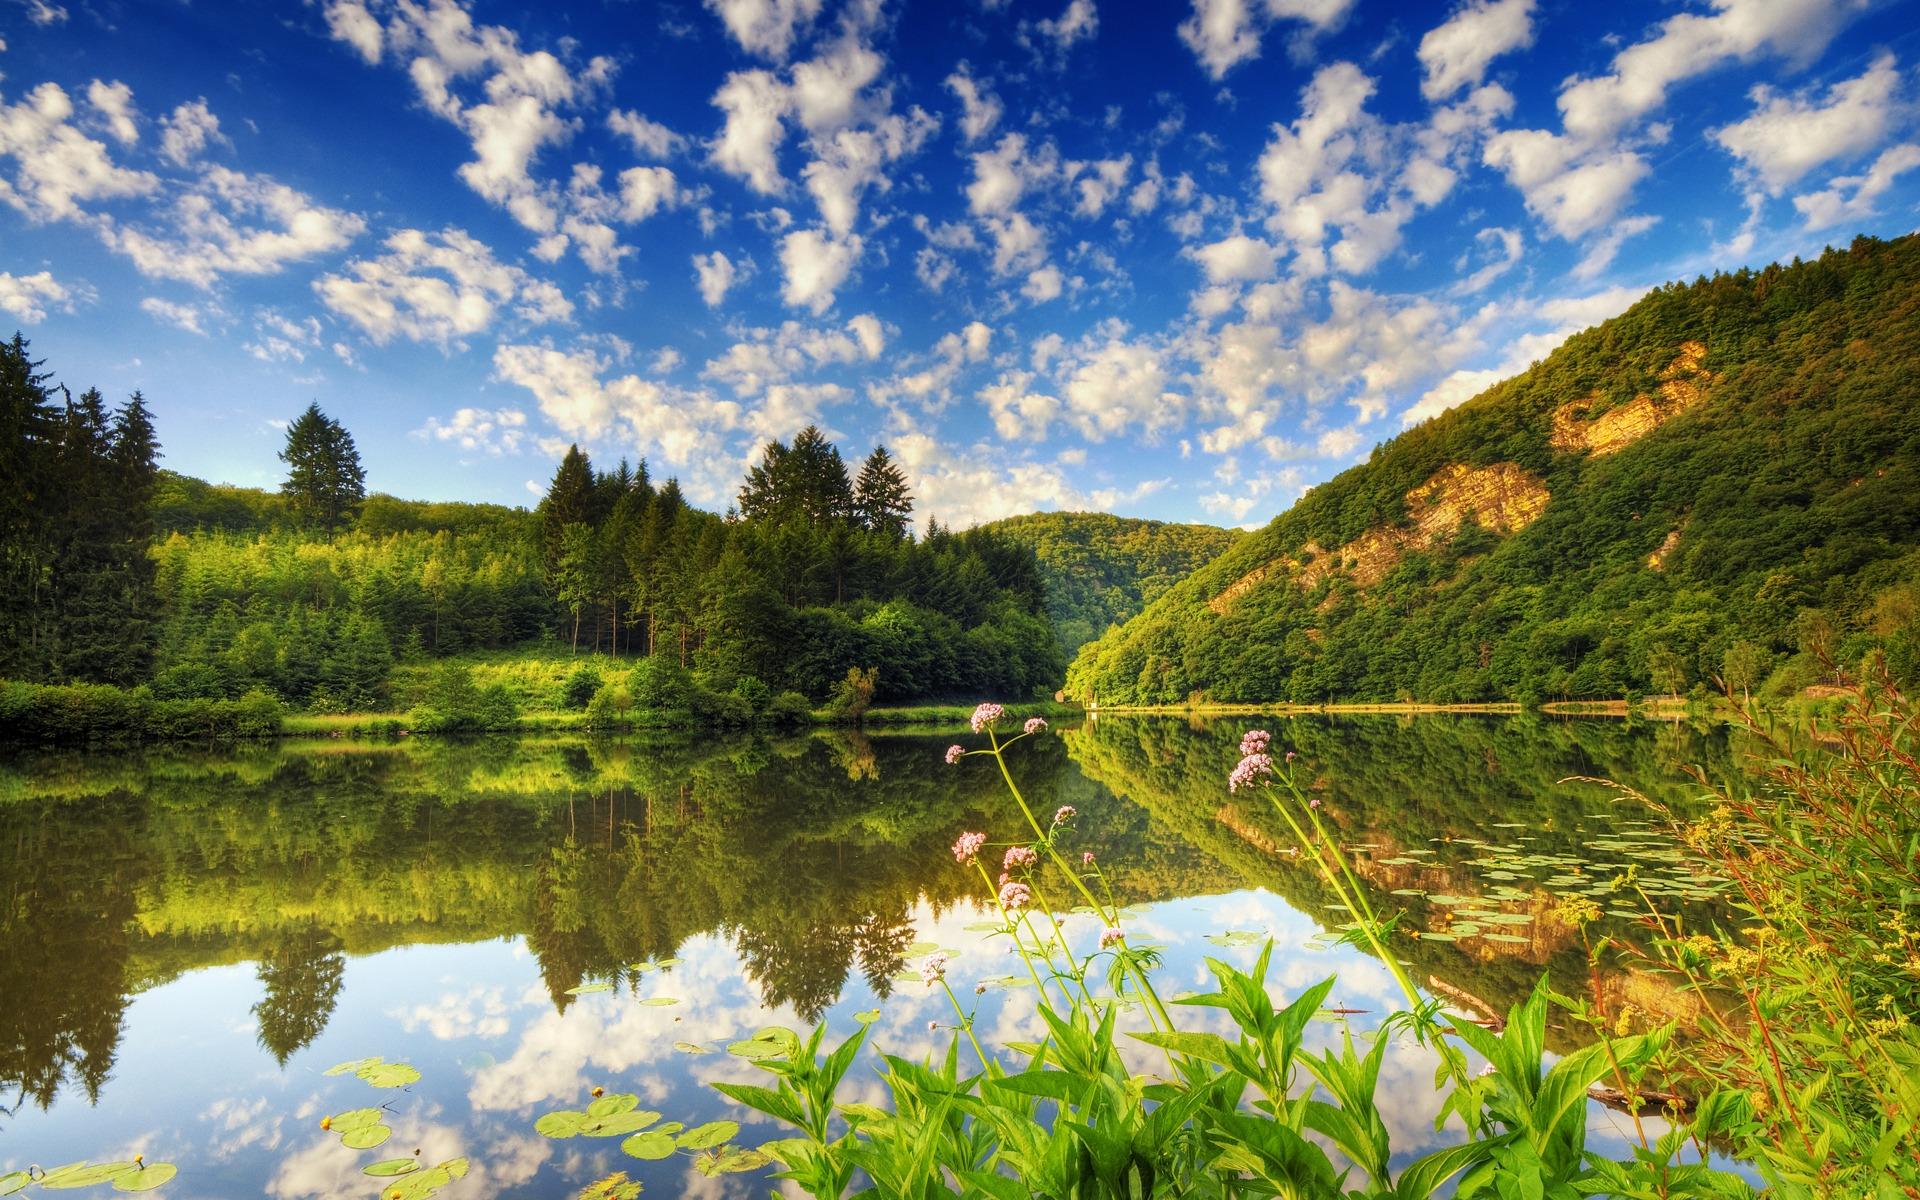 landscape pictures download - akba.katadhin.co